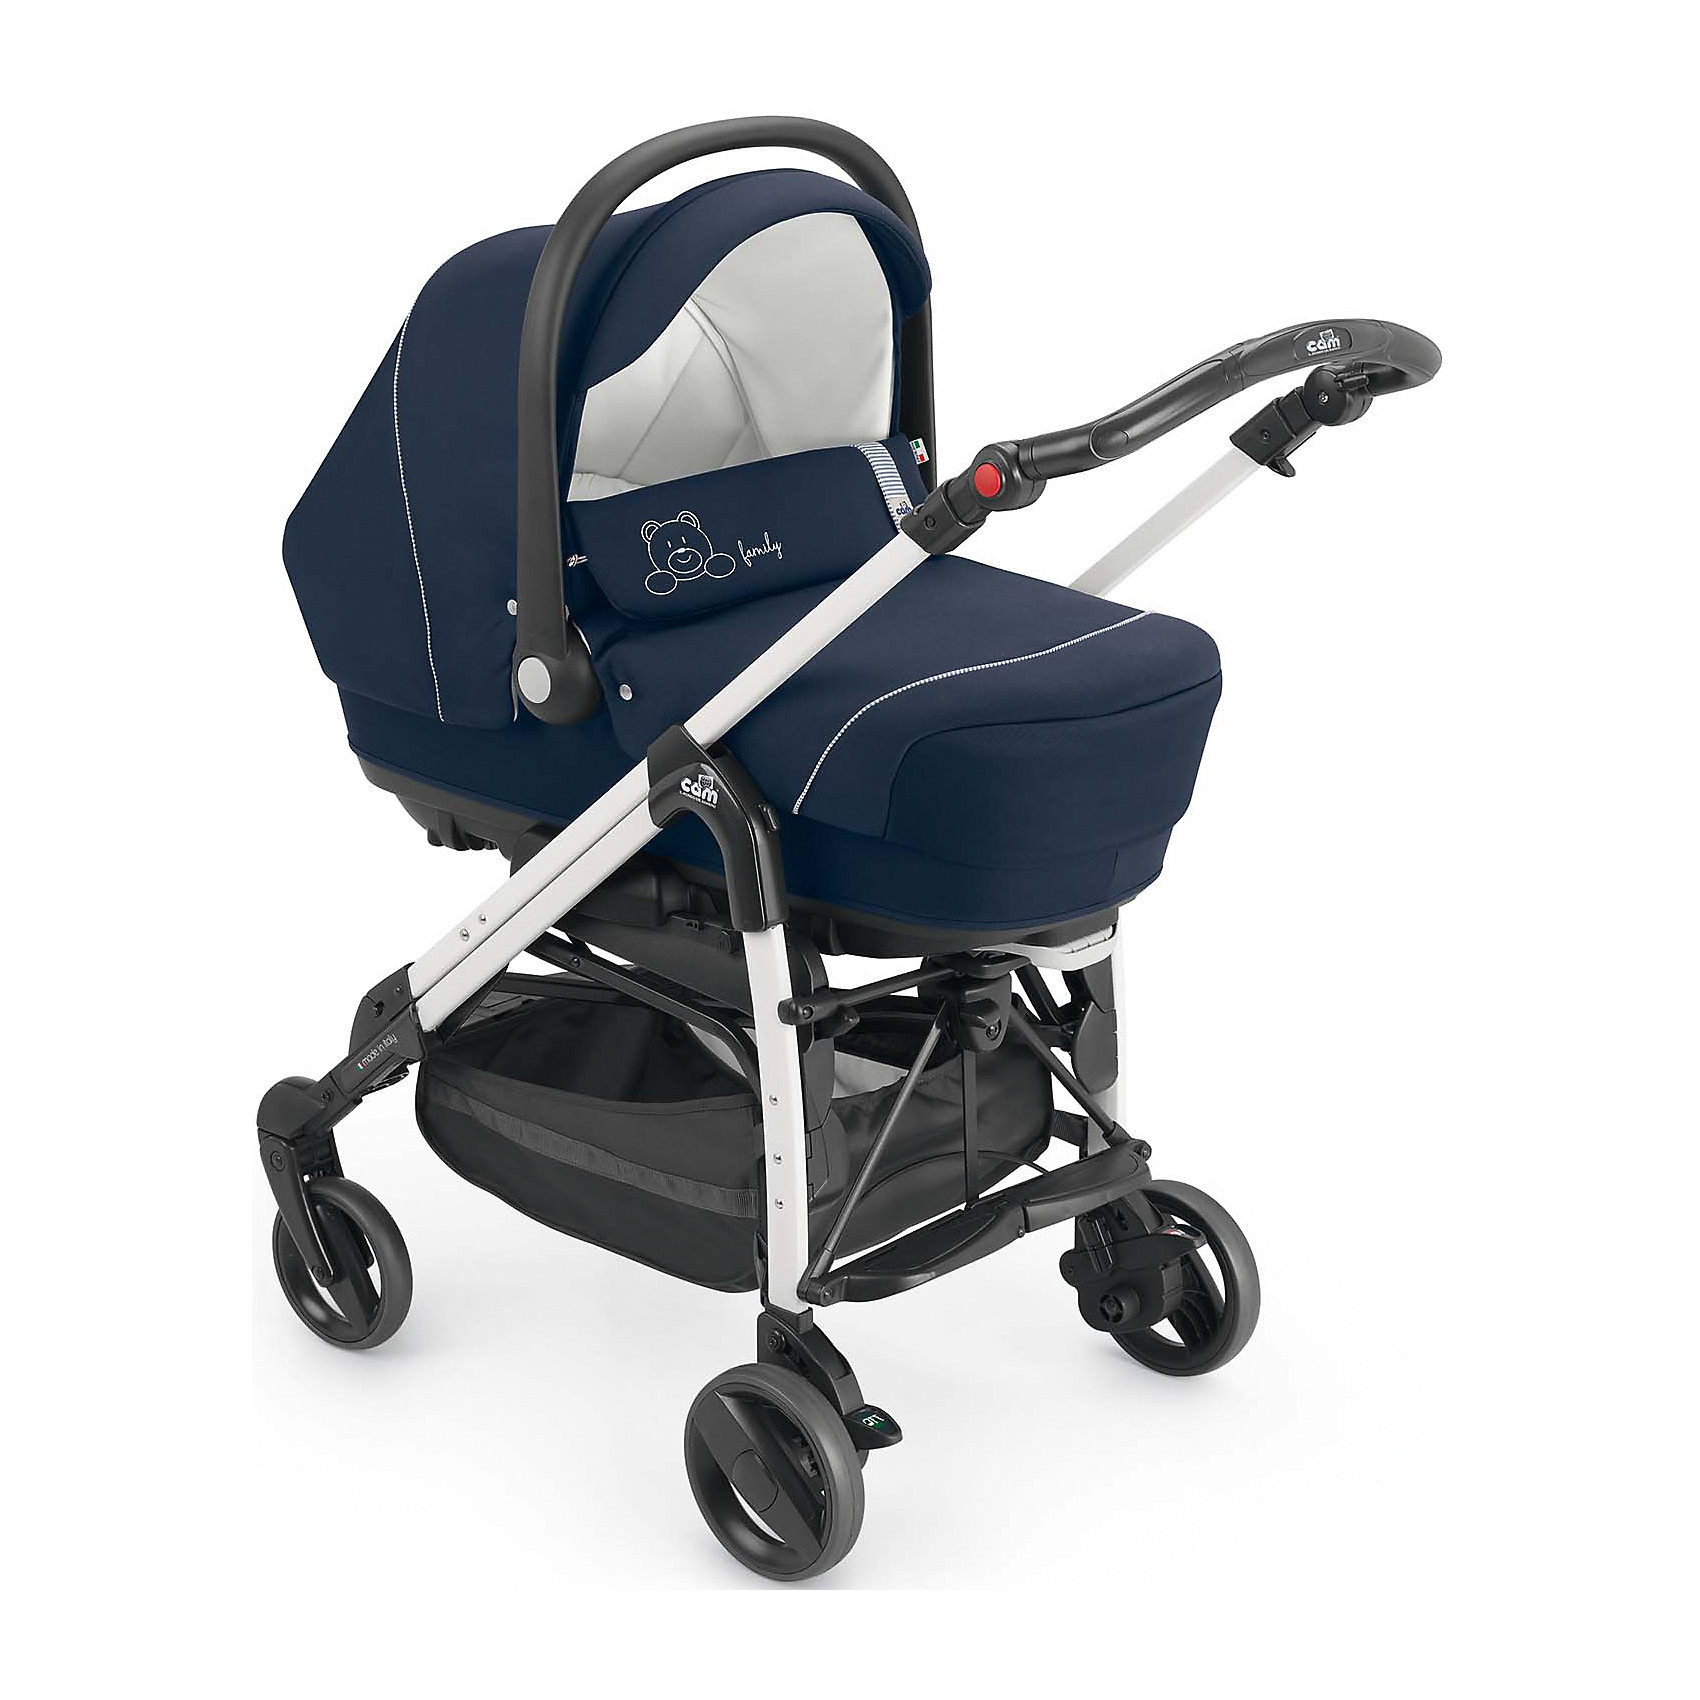 CAM Коляска 3-в-1 Comby Family, Cam, синий коляска 3 в 1 cam cortina x3 tris evolution цвет 638